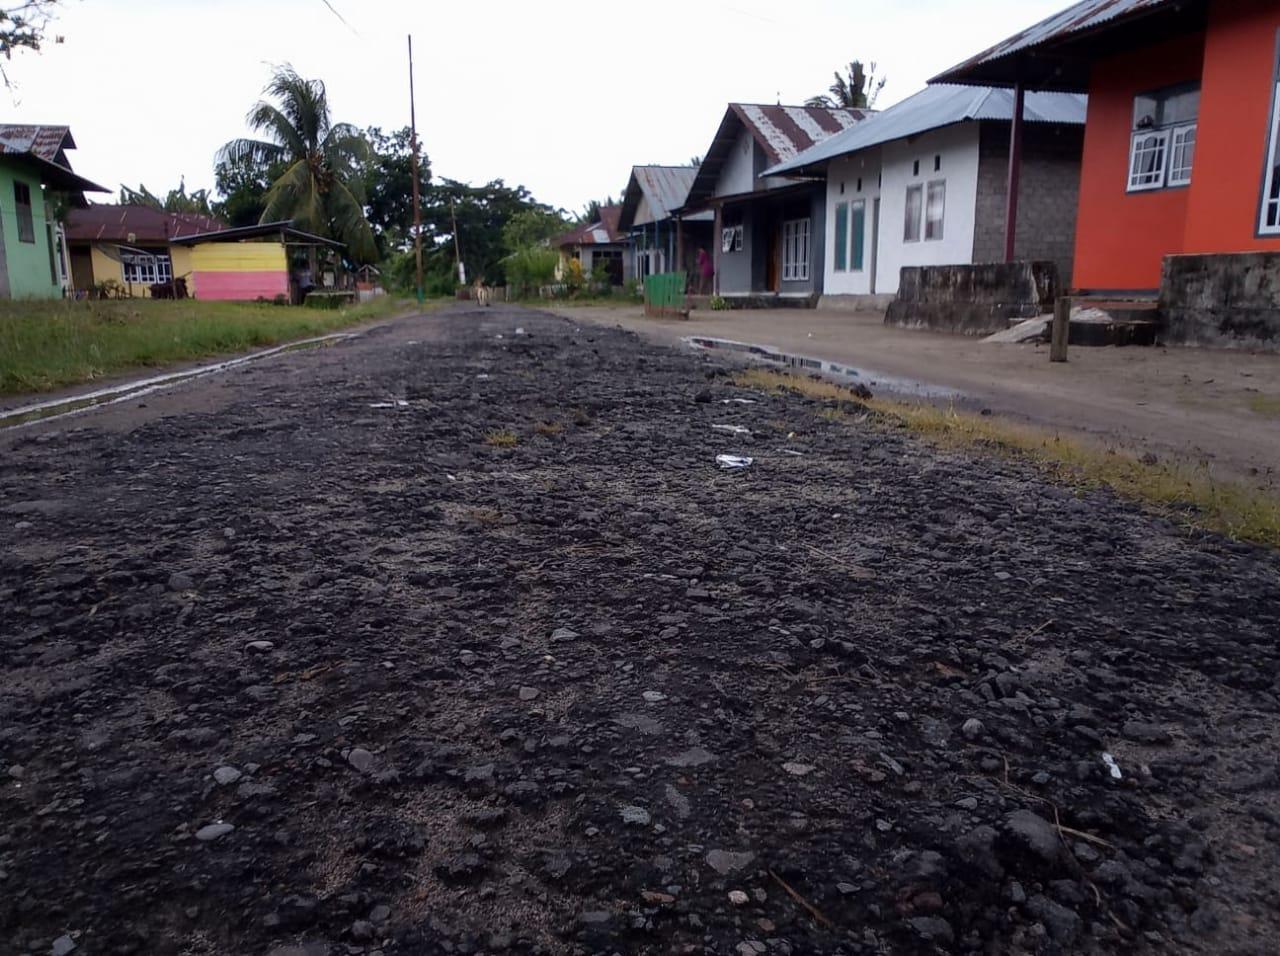 Warga Tuada, desak Pemda Halbar Segera Perbaiki Jalan Desa